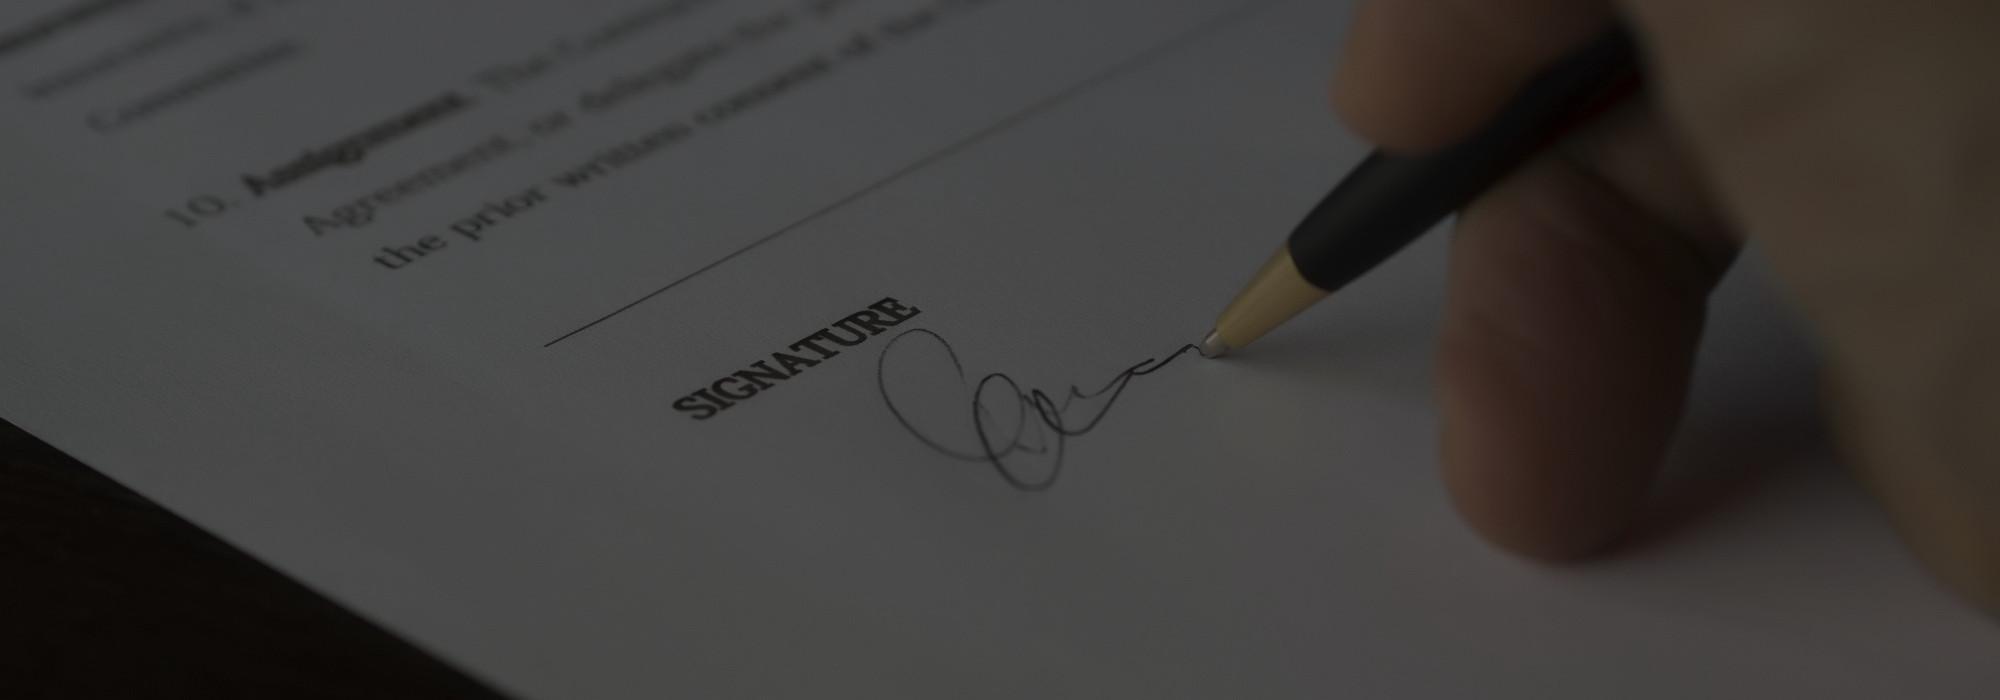 Membership-Application-Process-Banner